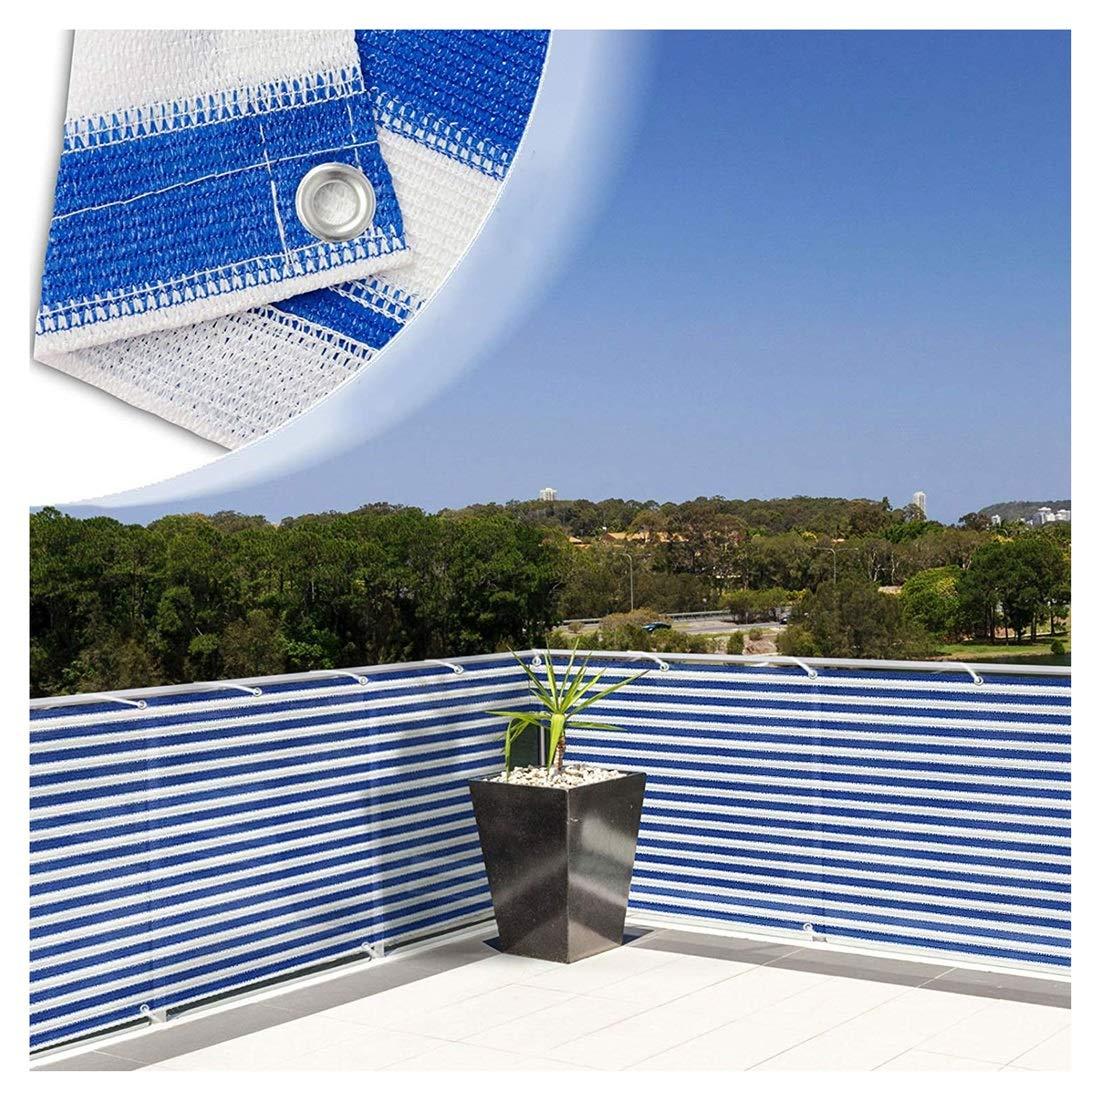 Toldo Vela Rectangular, Vela de Sombra Sombrillas Sombra Tela de Tela 95% Bloqueo UV Malla Neta Privacidad Valla de Detección de Vallas con Ojales Vallado Para Exteriores Patio Jardín Planta Granero I: